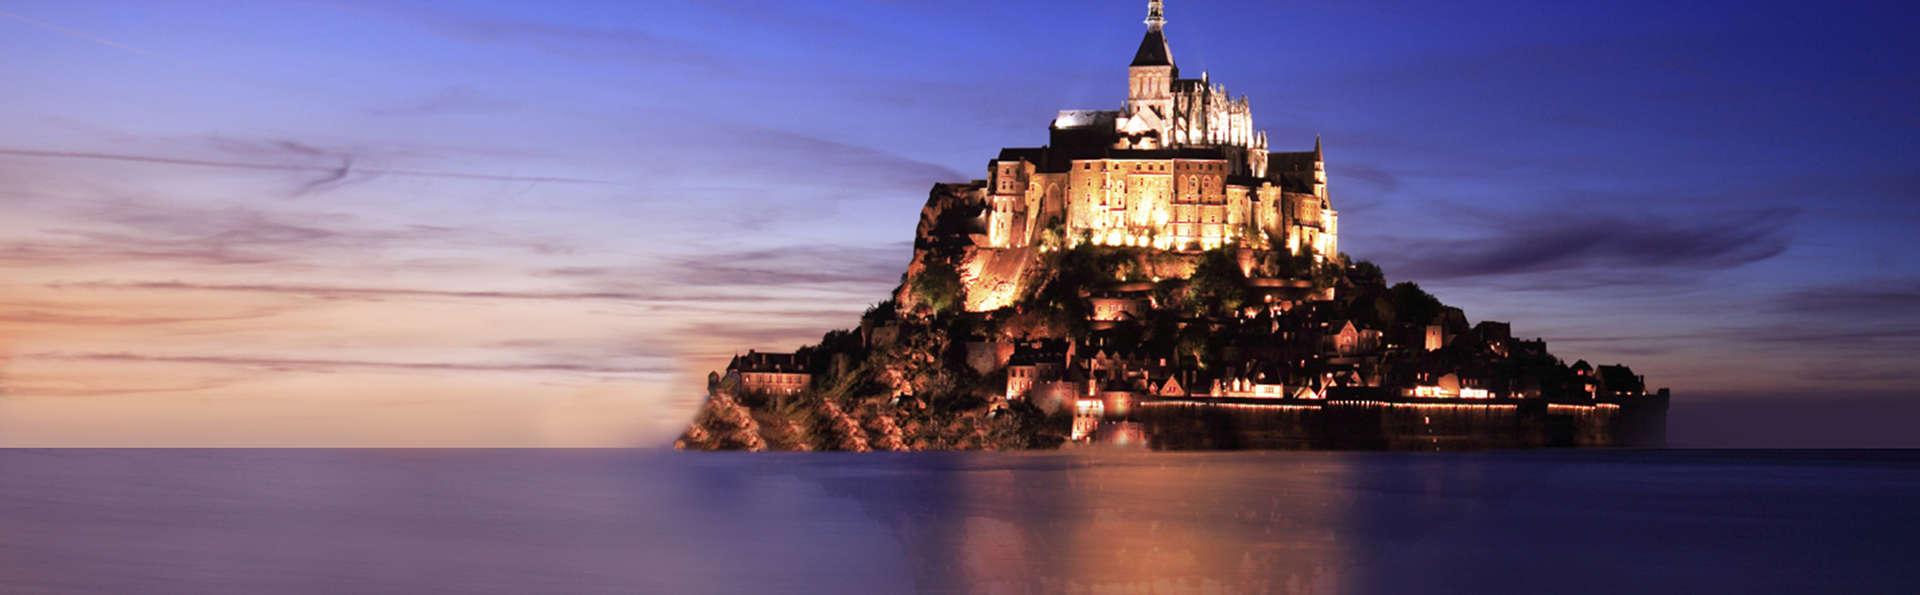 Prestige kamer op de Mont-Saint-Michel